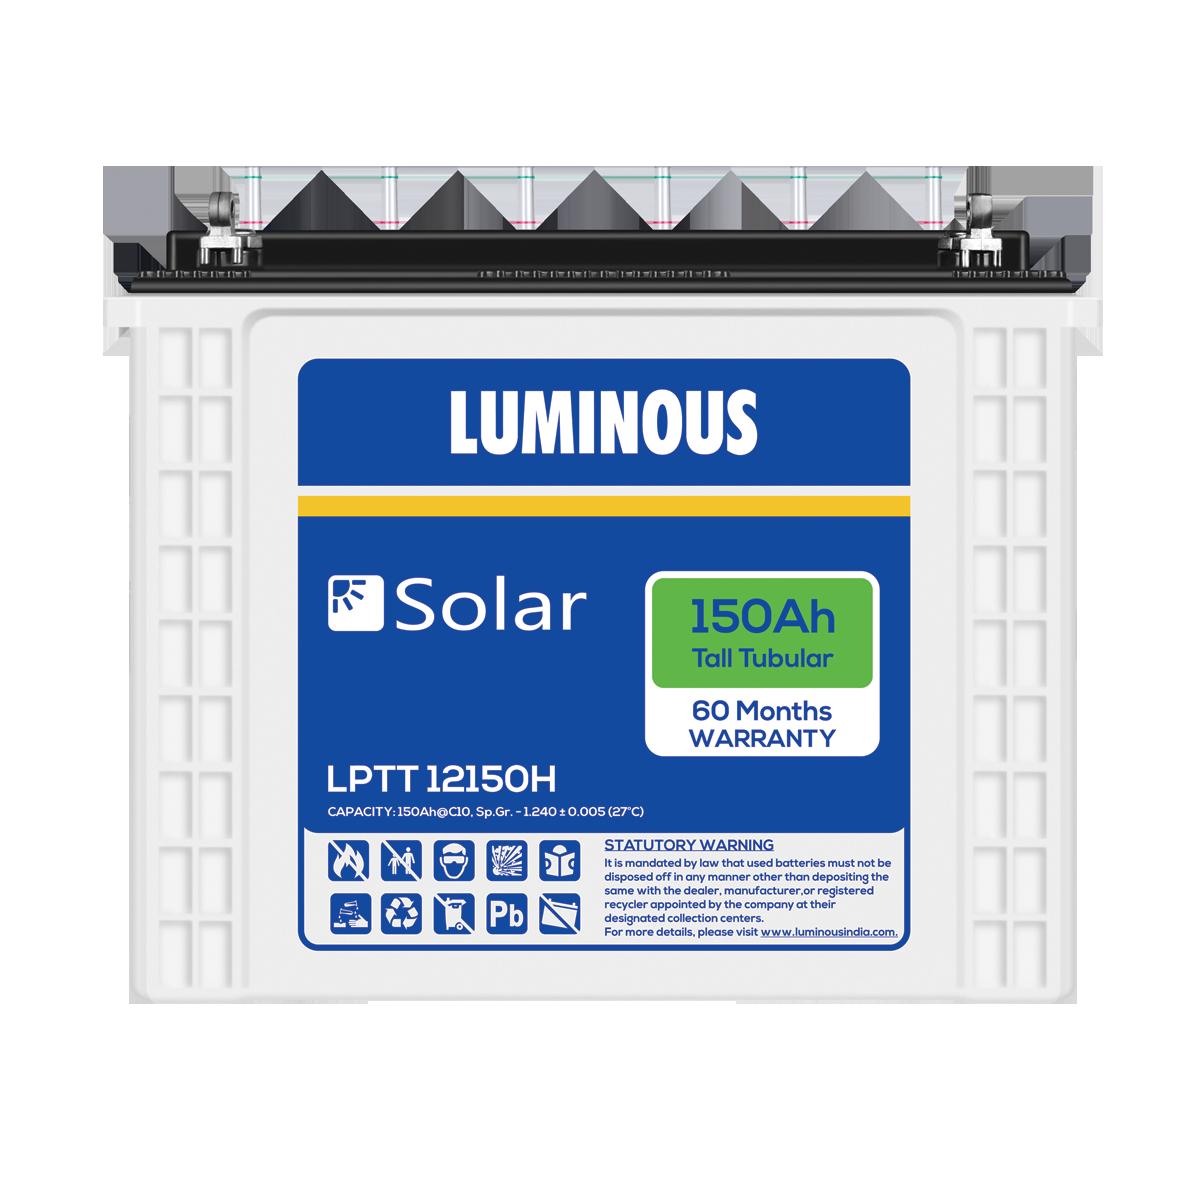 Luminous Solar 150 Ah Tall Tubular battery | Solar Battery Price